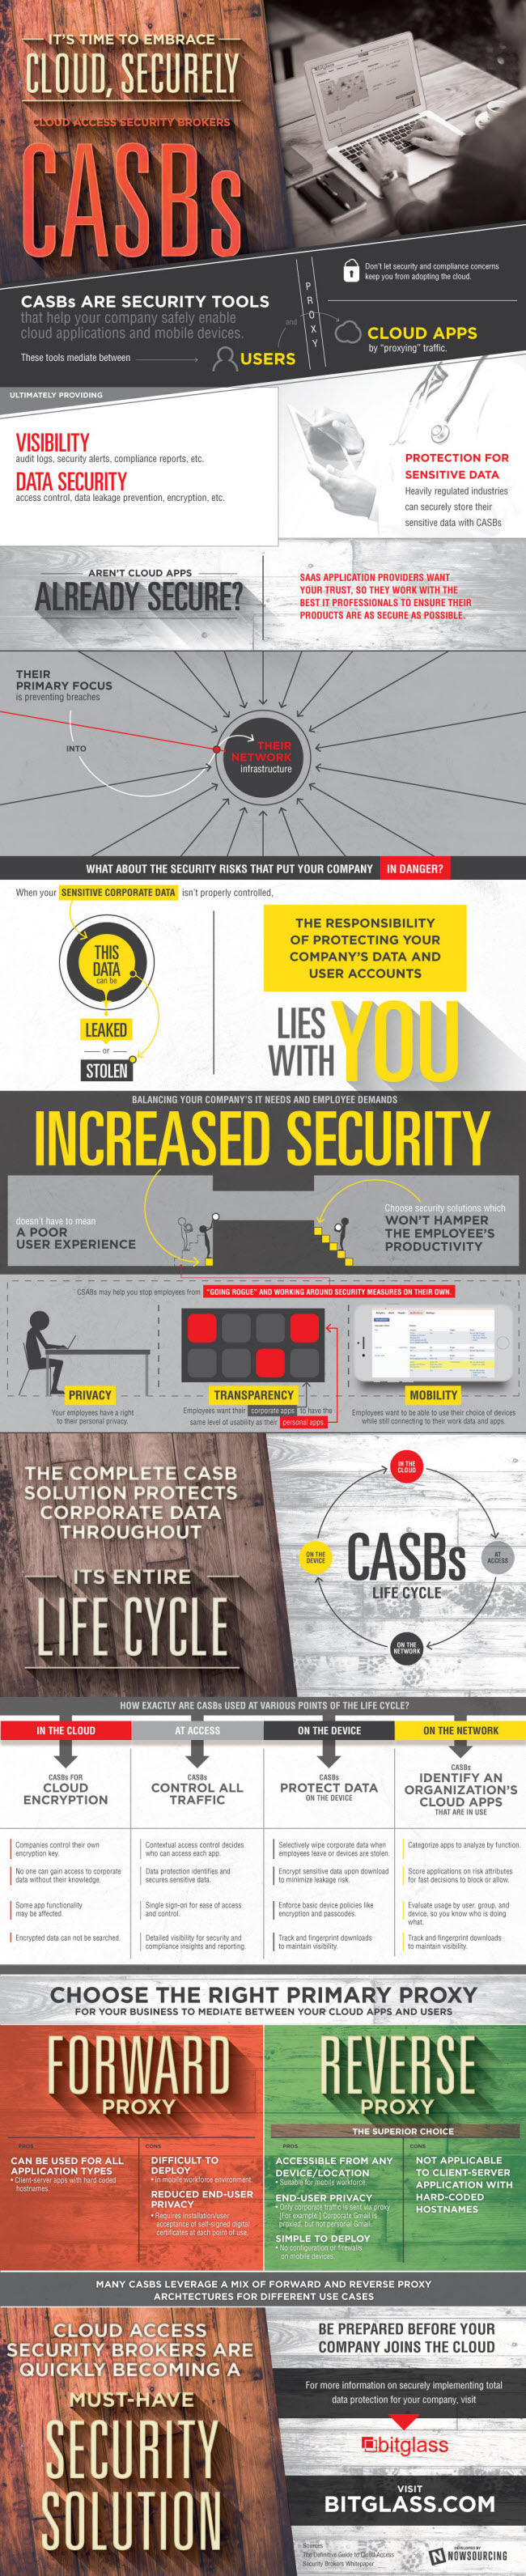 Cloud Access Security Brokers